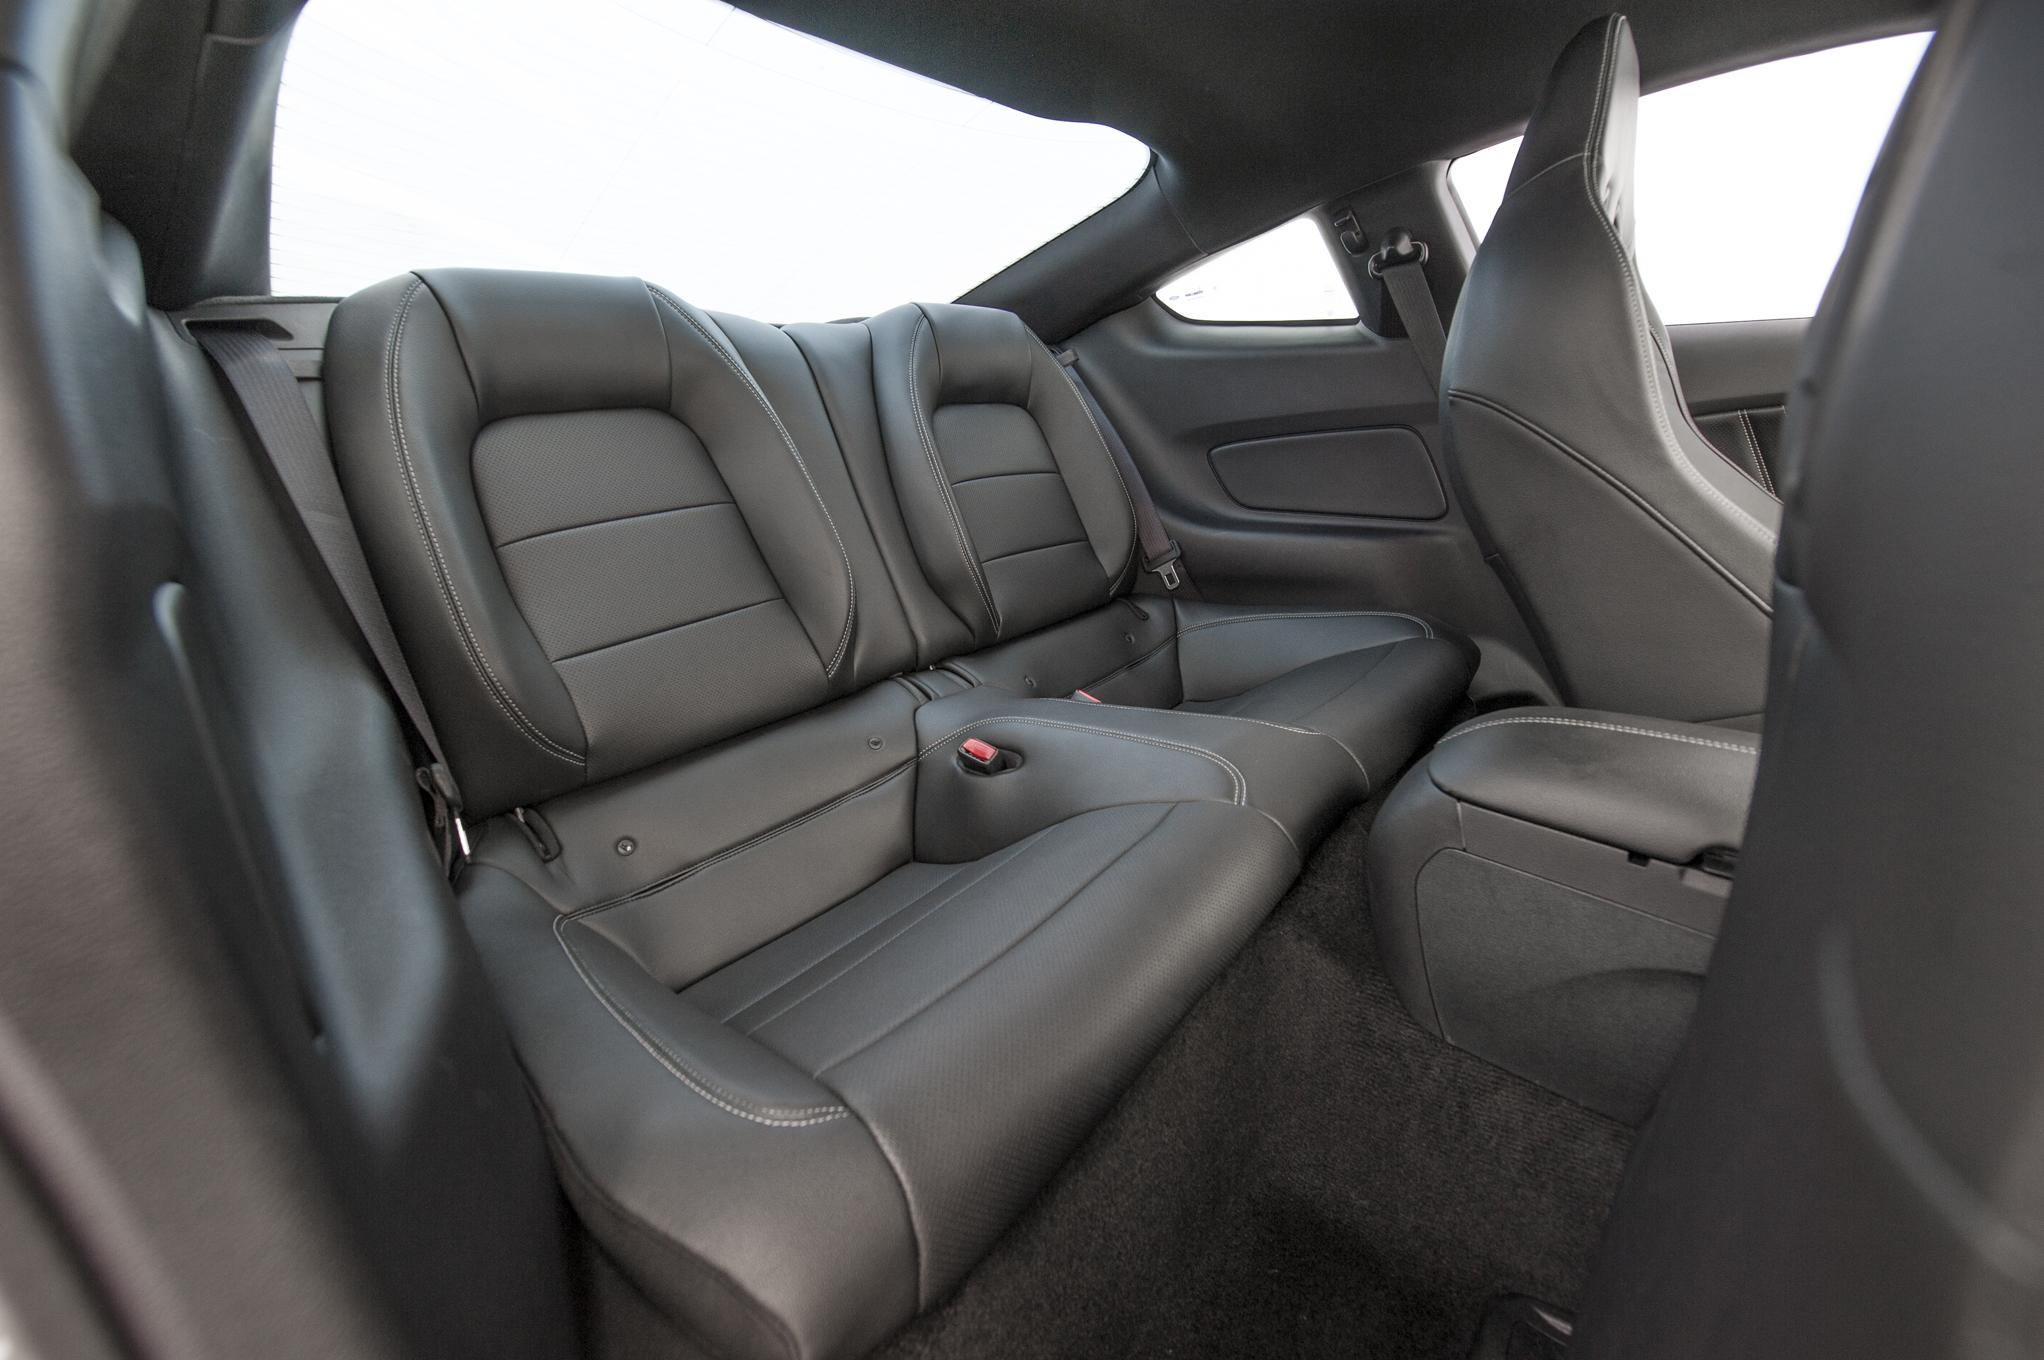 2015 Ford Mustang GT Rear Seats Interior